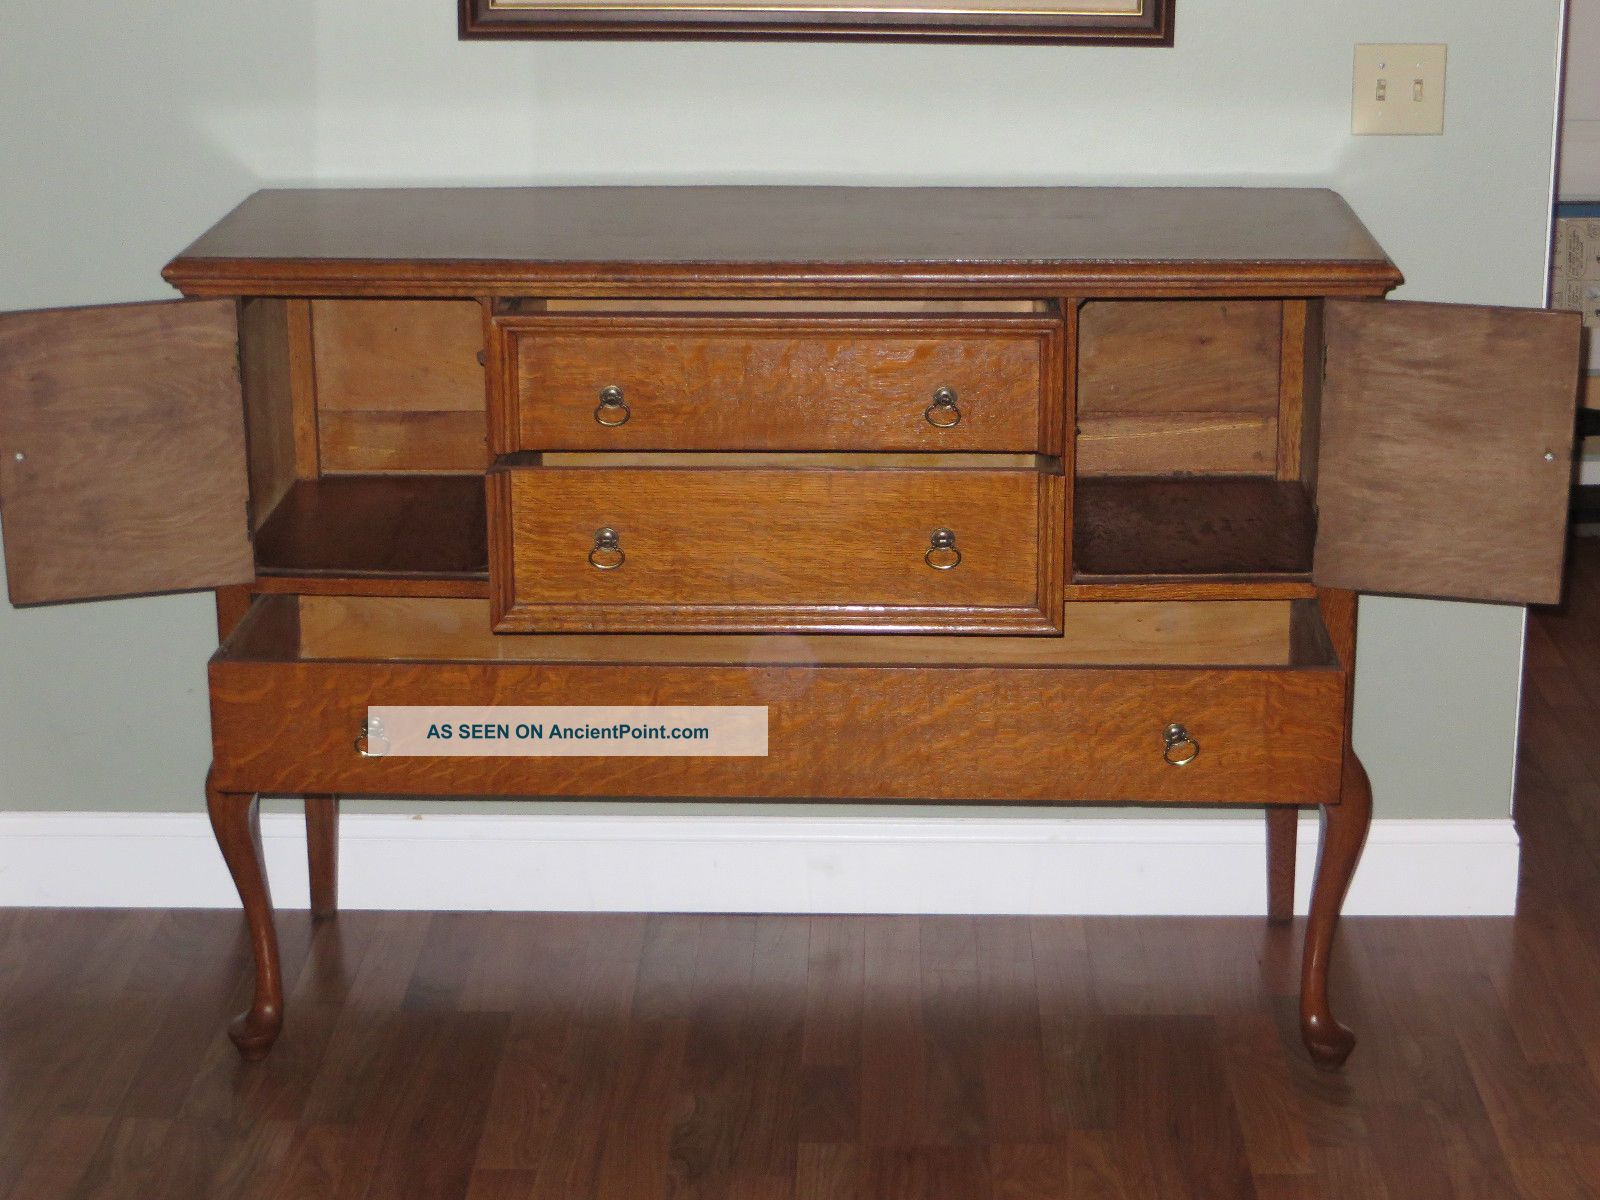 Antique tiger oak buffet sideboard images for Sideboard queens